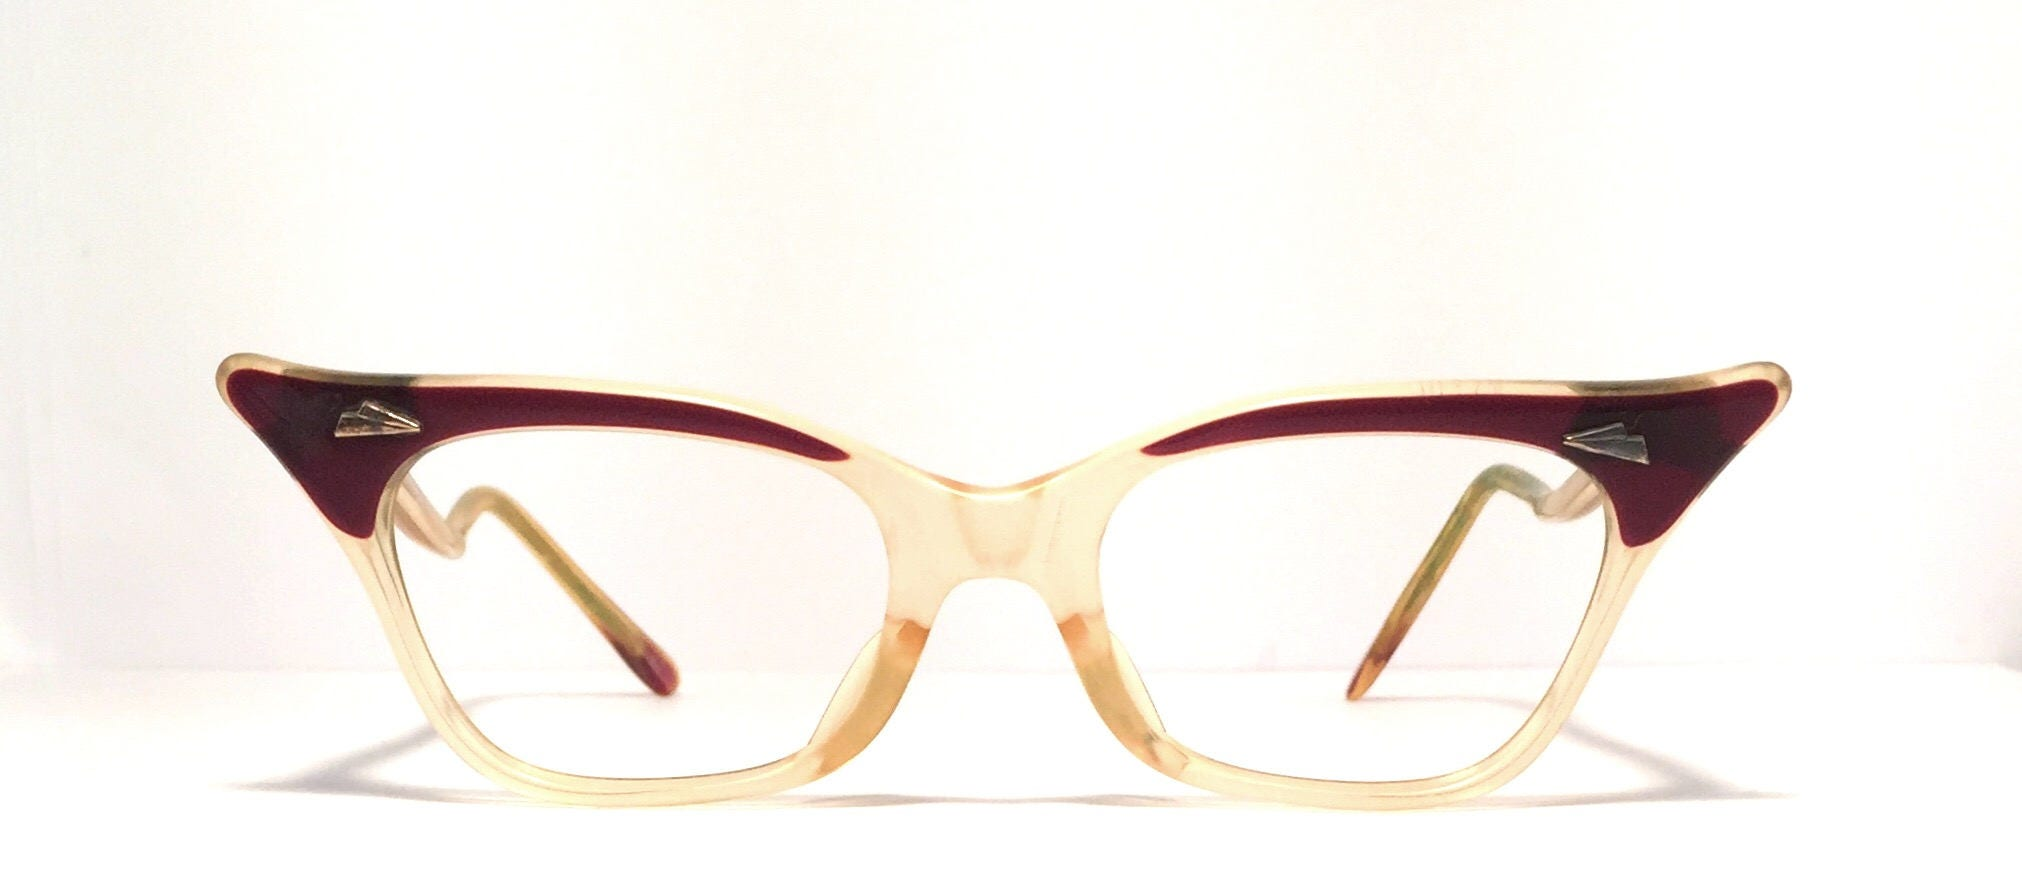 6b10f16167 Vintage eyewear. Cat eye style. Unique curvy side profile! Dark brown and  Amber